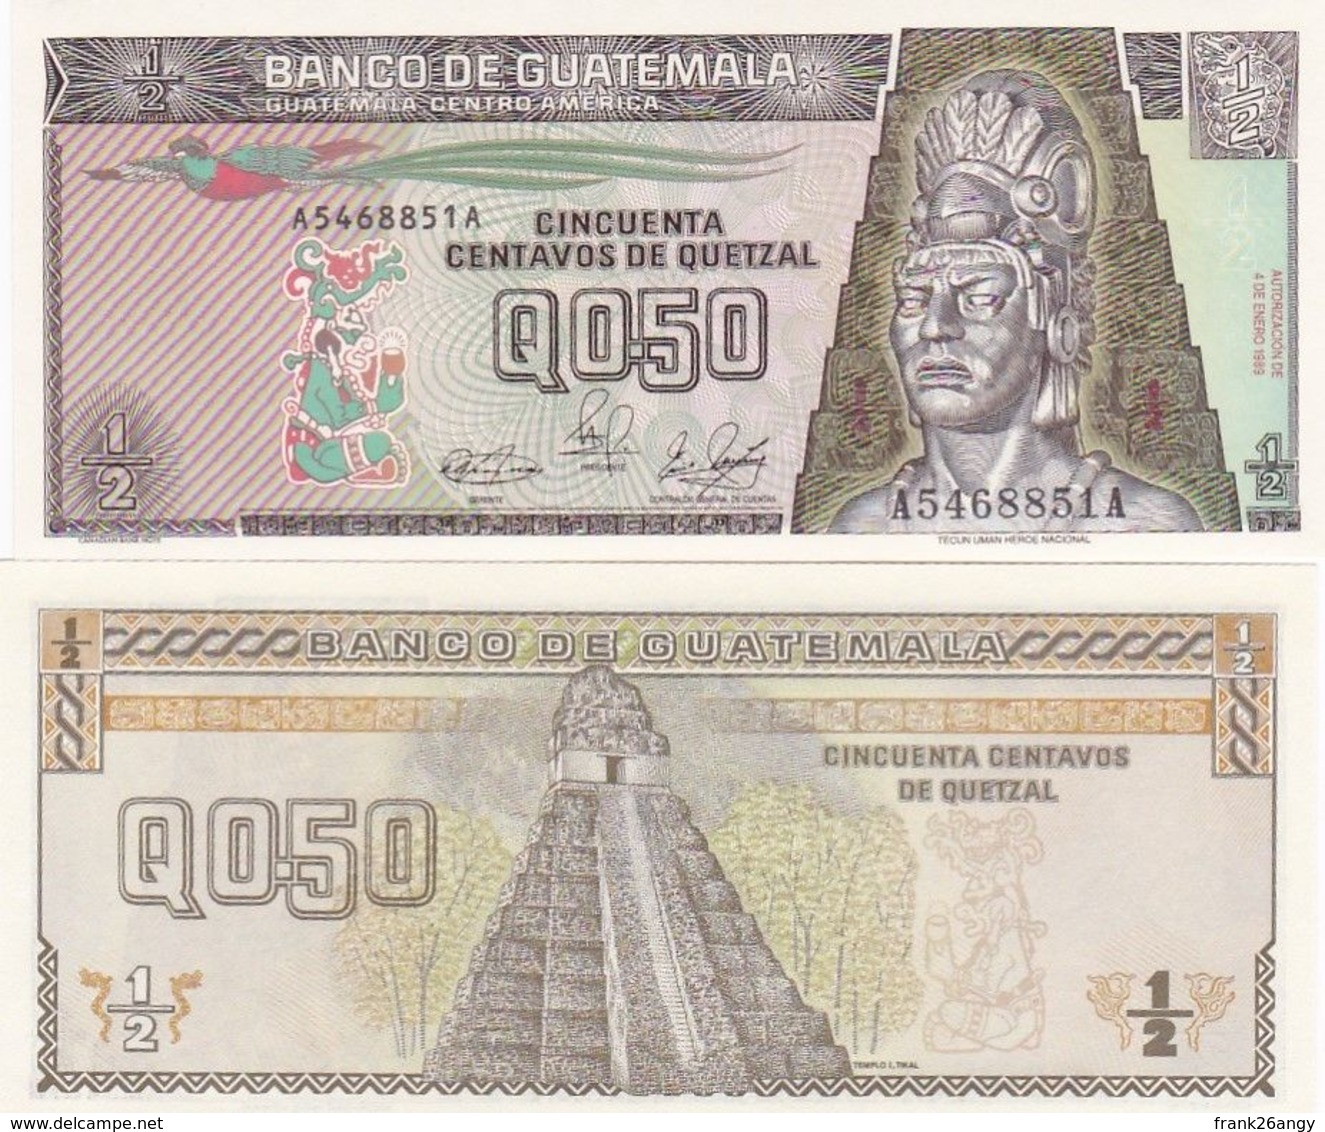 GUATEMALA - 1989 - Banconota Da 0,50 Quetzal Pick 65 In Condizioni Di FDS - Guatemala